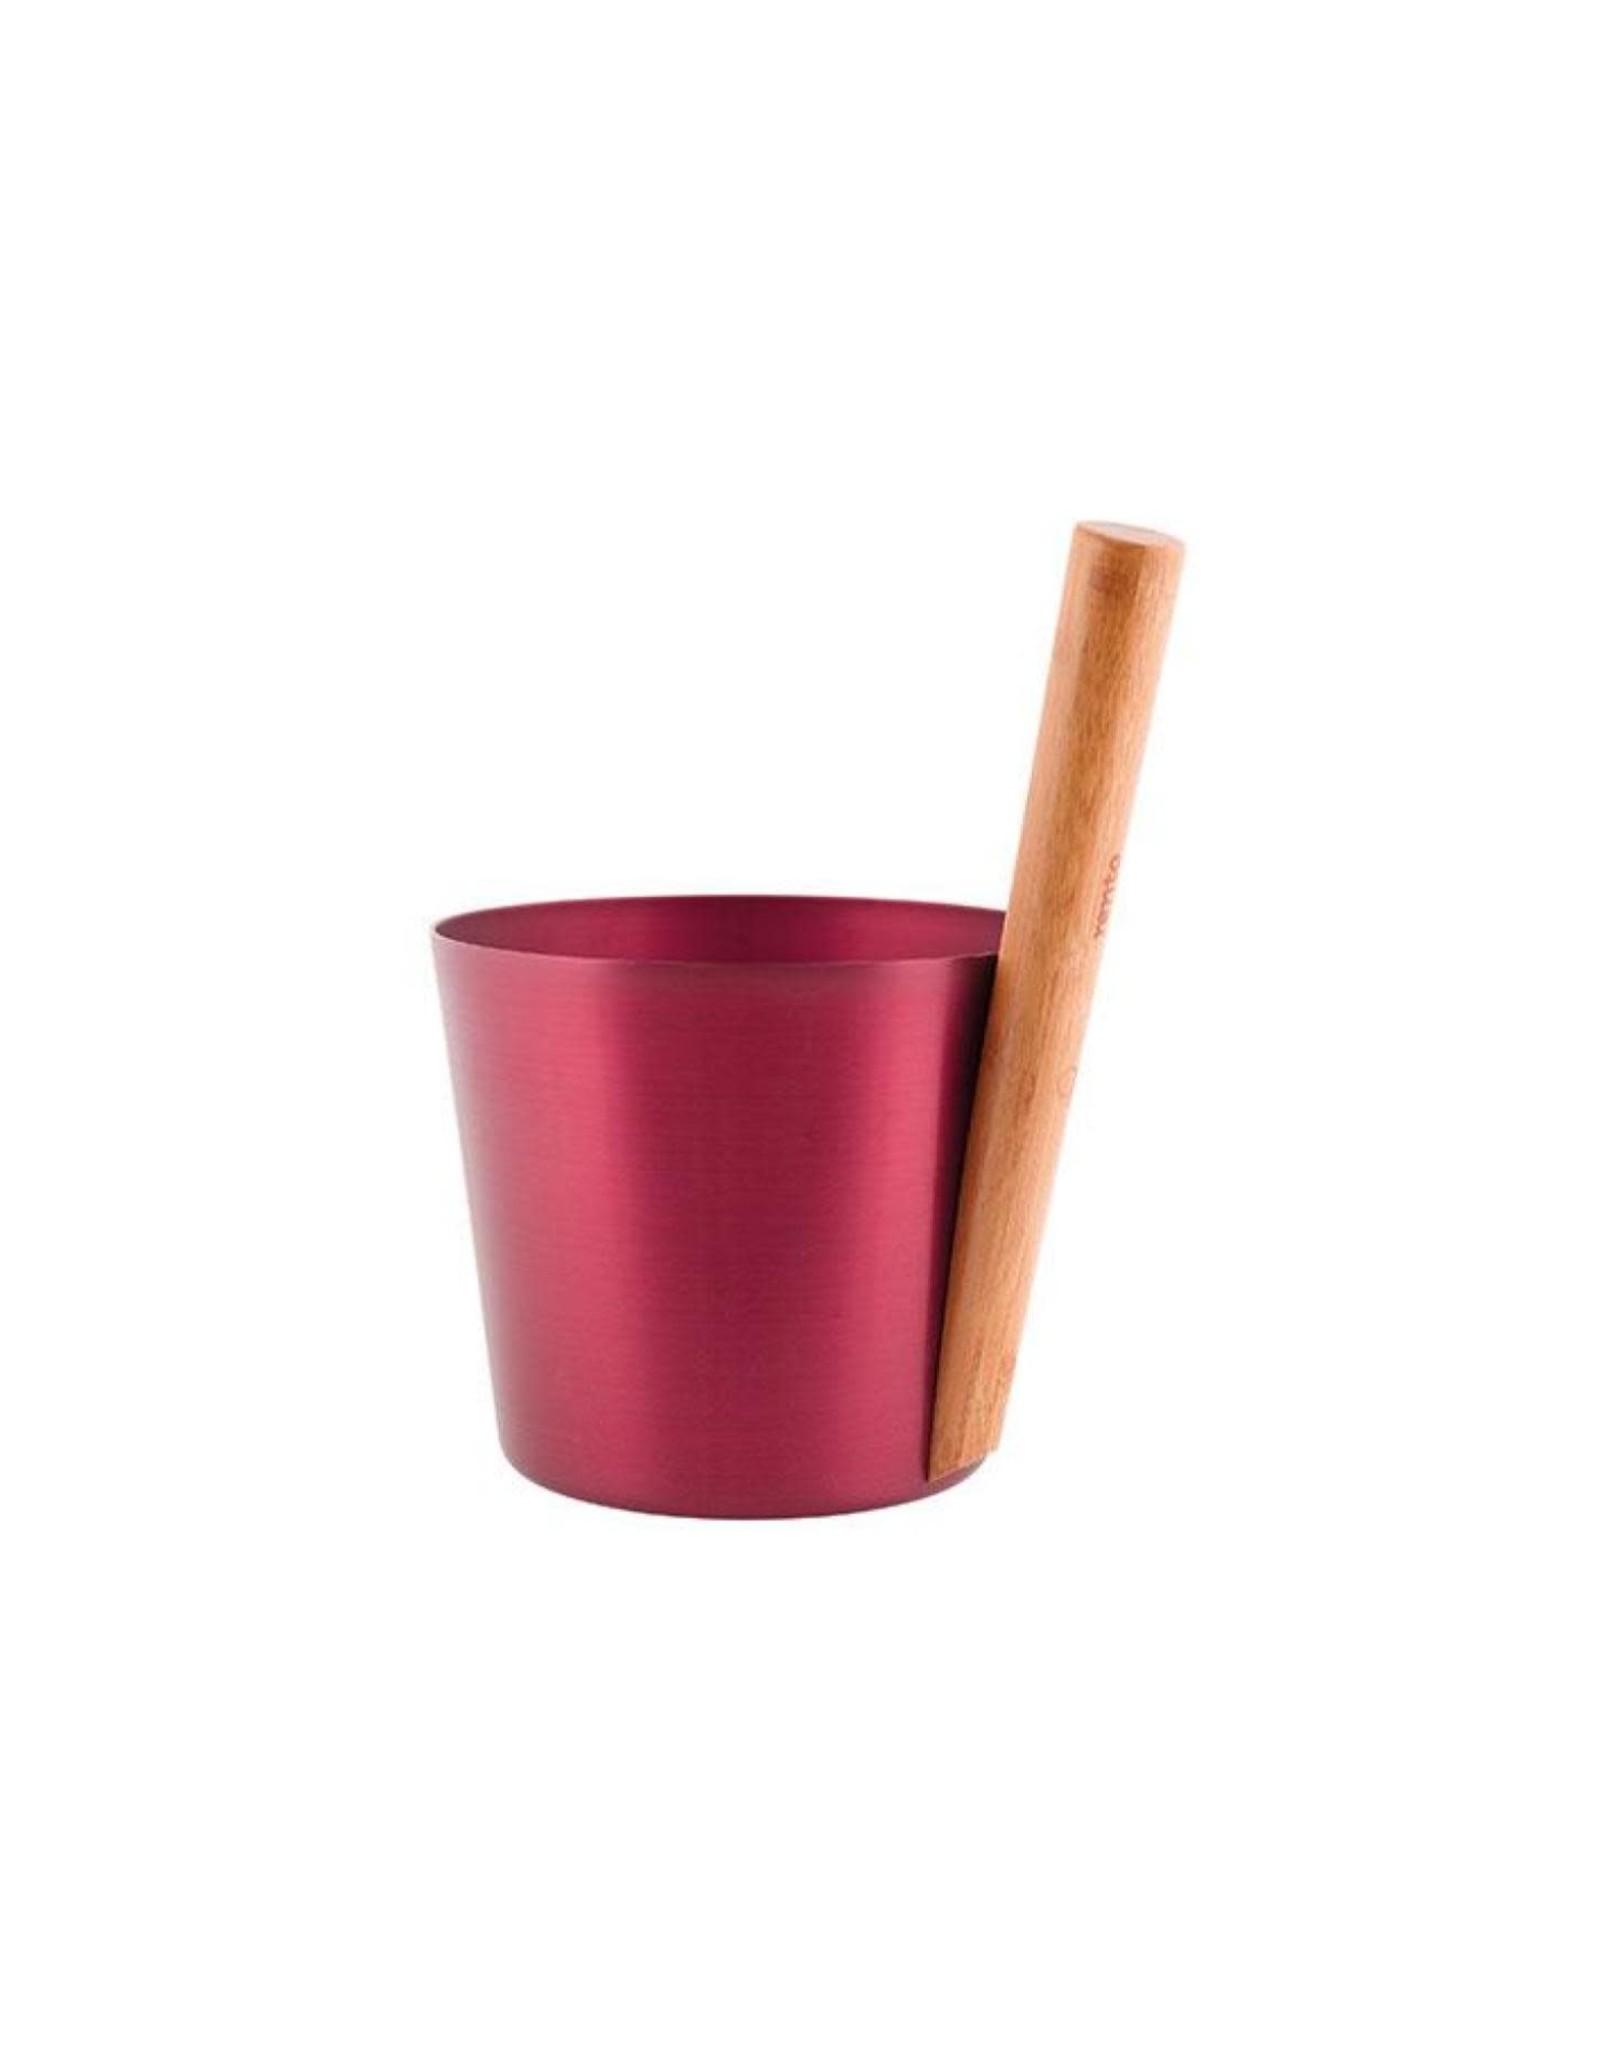 Rento Rento Aluminum Bucket